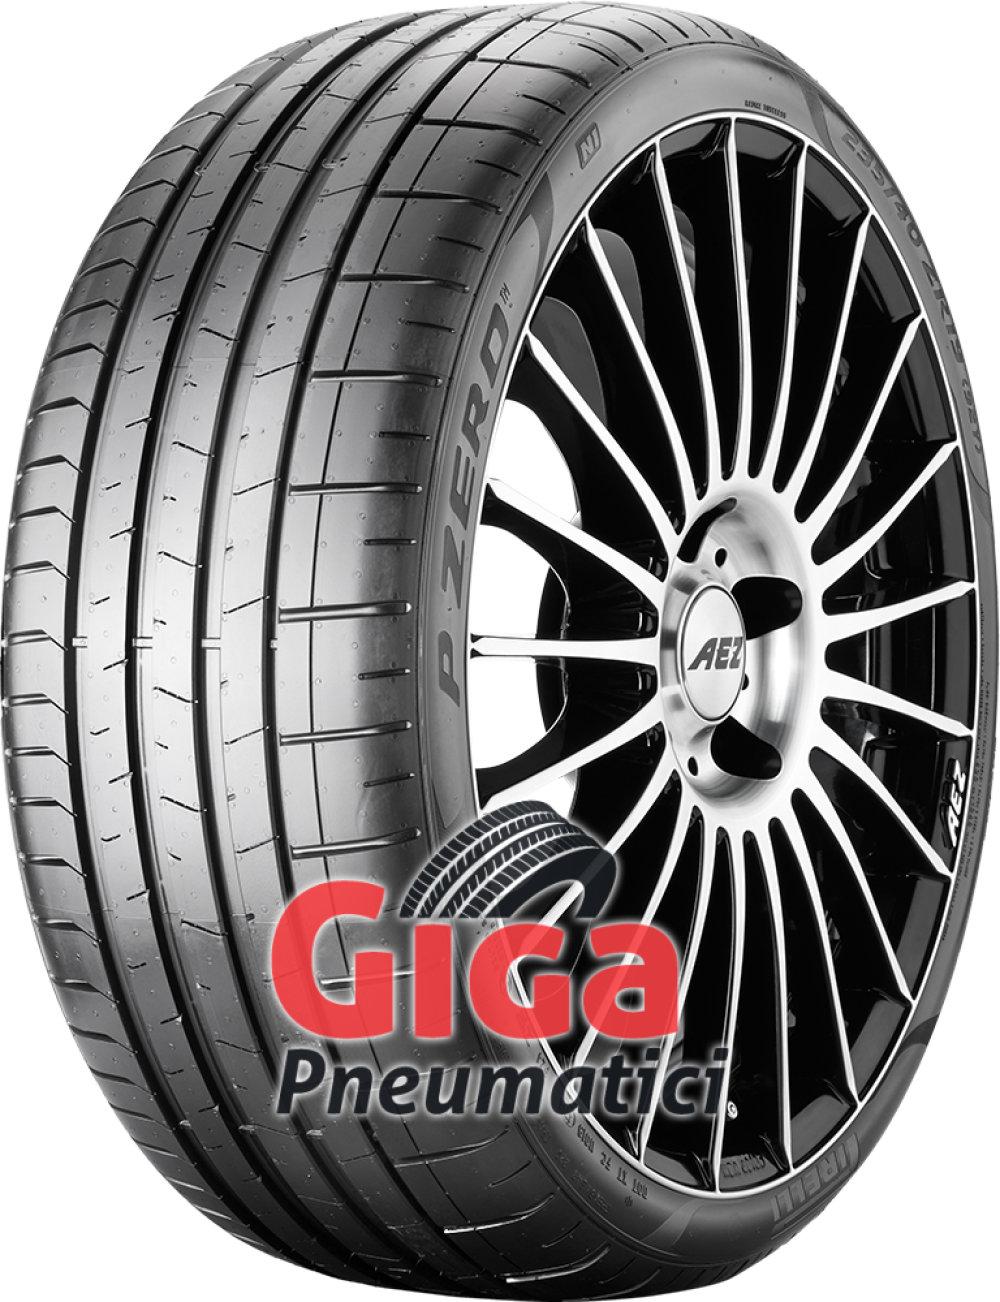 Pirelli P Zero SC ( 245/35 ZR20 (95Y) XL F03 )